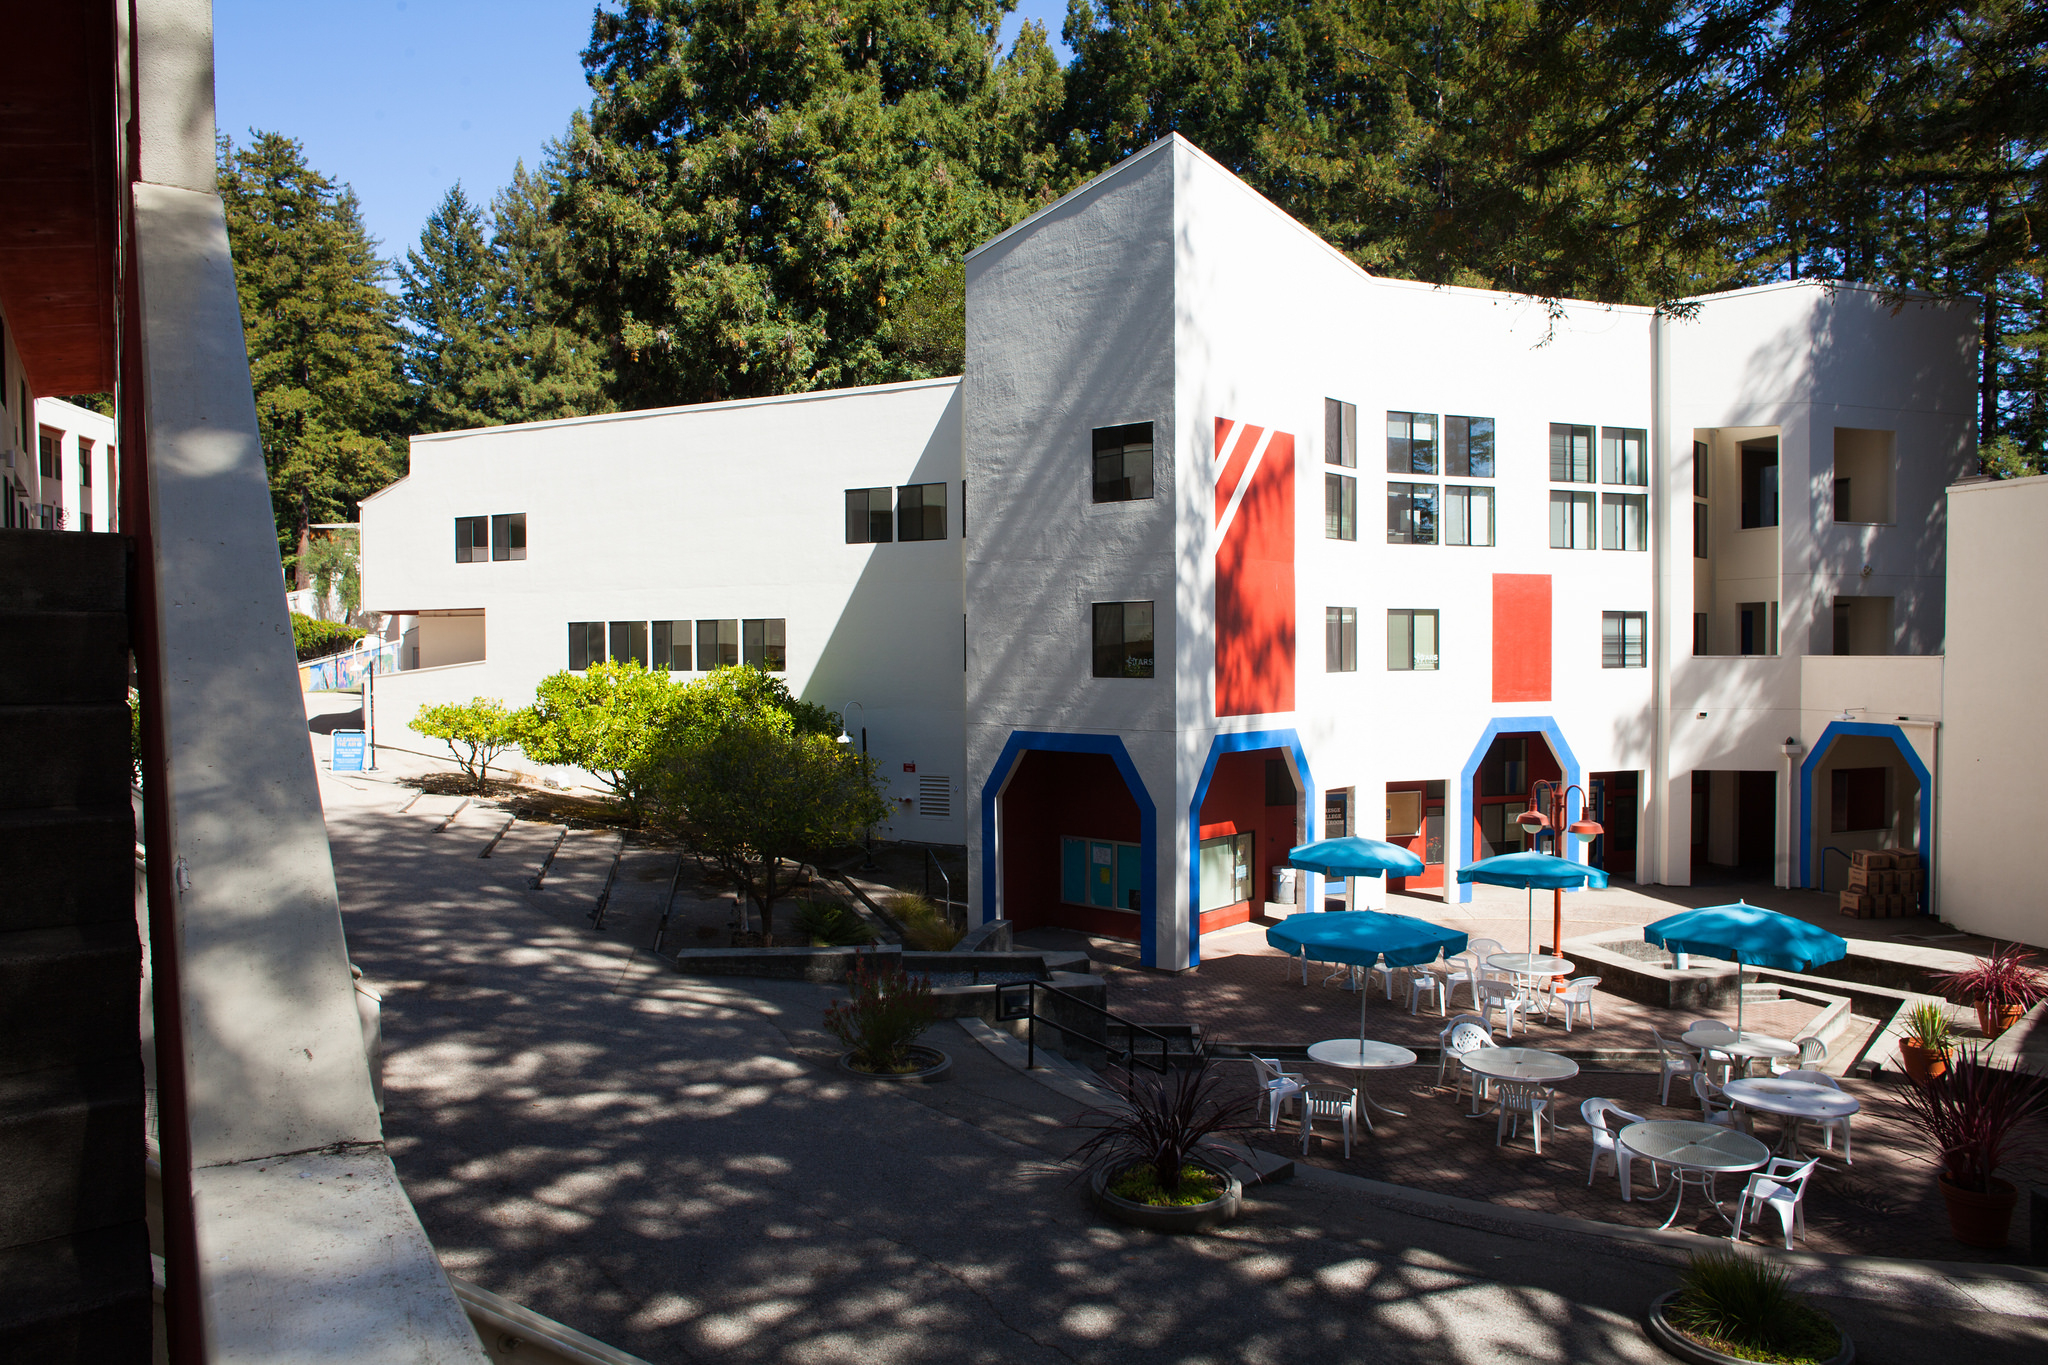 Google Maps Kresgie College Us Santa Cruz | Travel Maps And Major - Google Maps Santa Cruz California